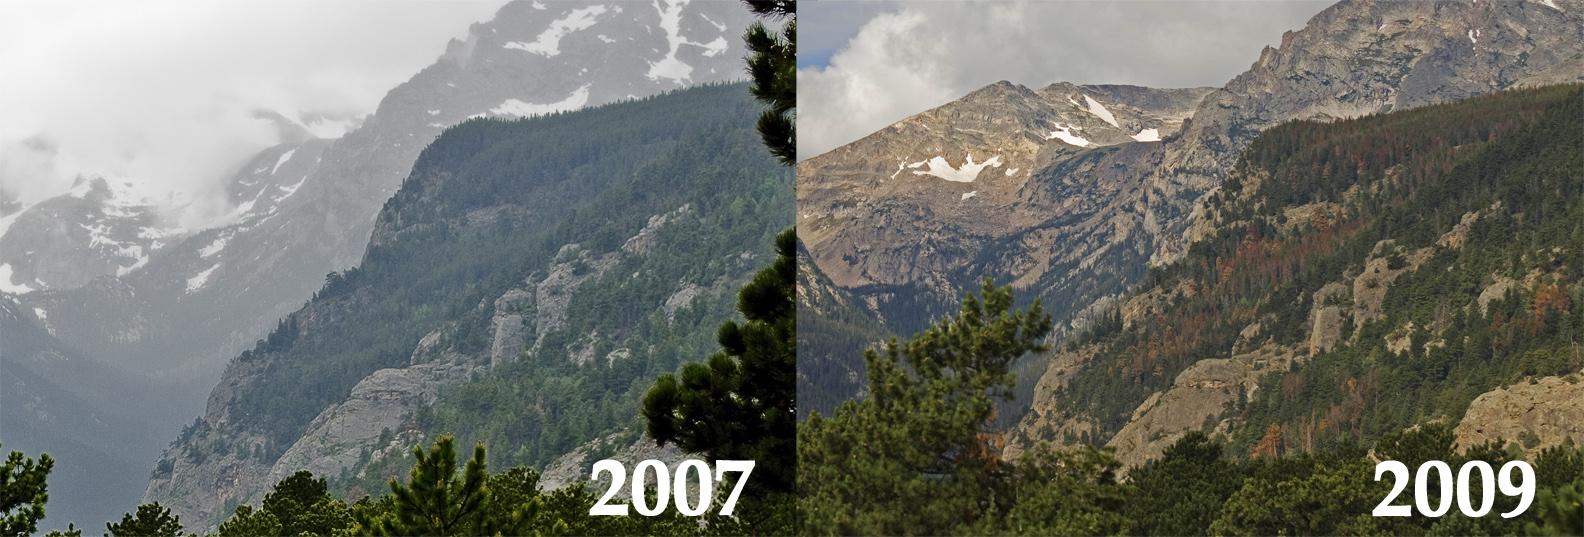 2007_2009-moraine-park-campground-comparison-rmnp-2